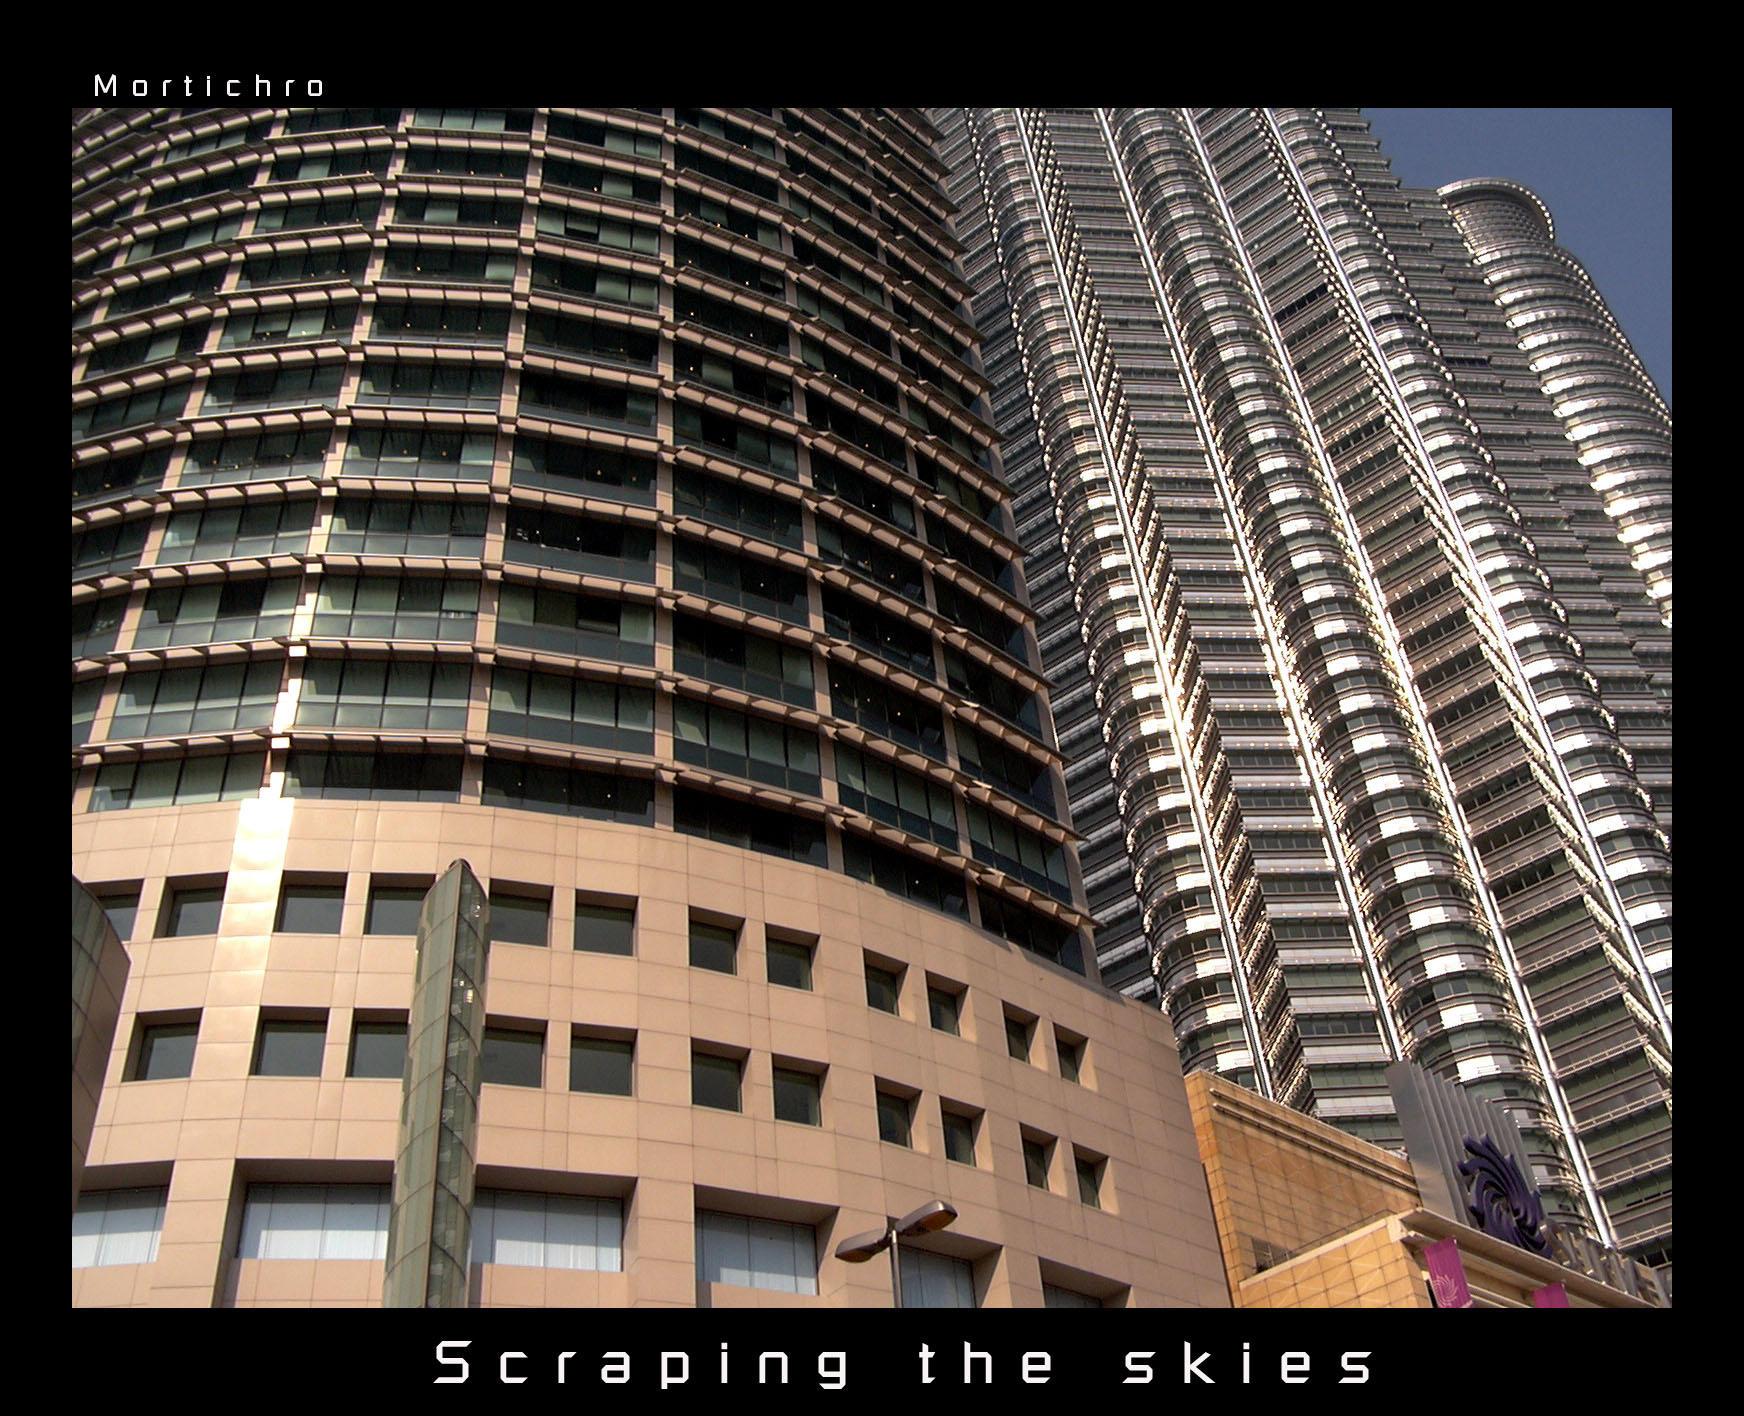 sKraping the sCy by mortichro